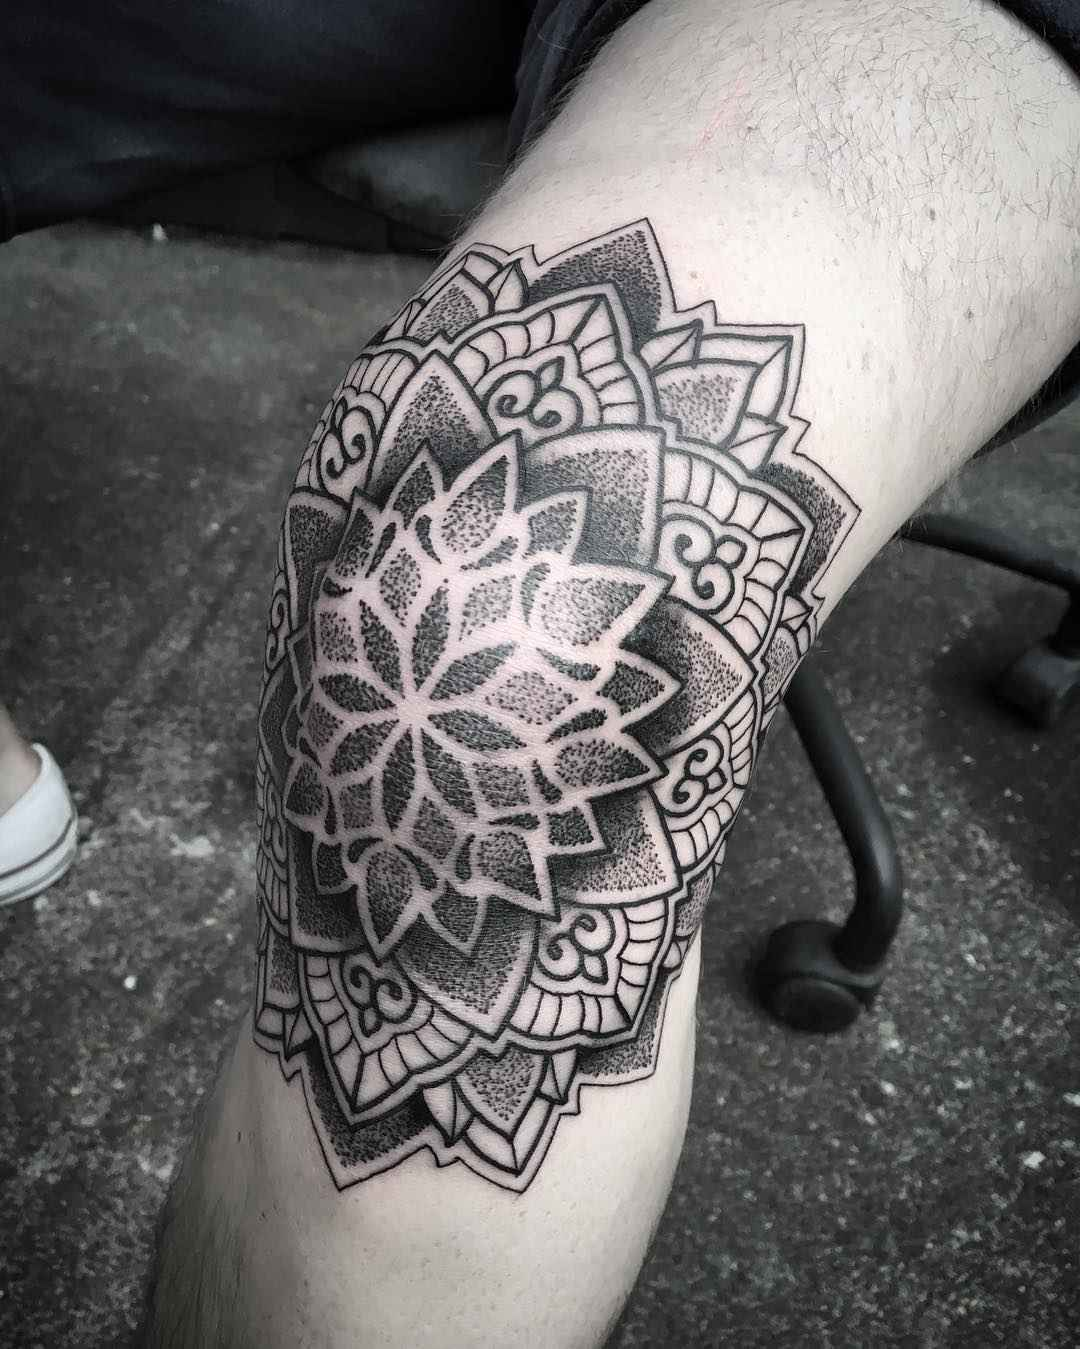 Tattoo artist chris bint southend on sea united kingdom for Best tattoo artists in the southeast